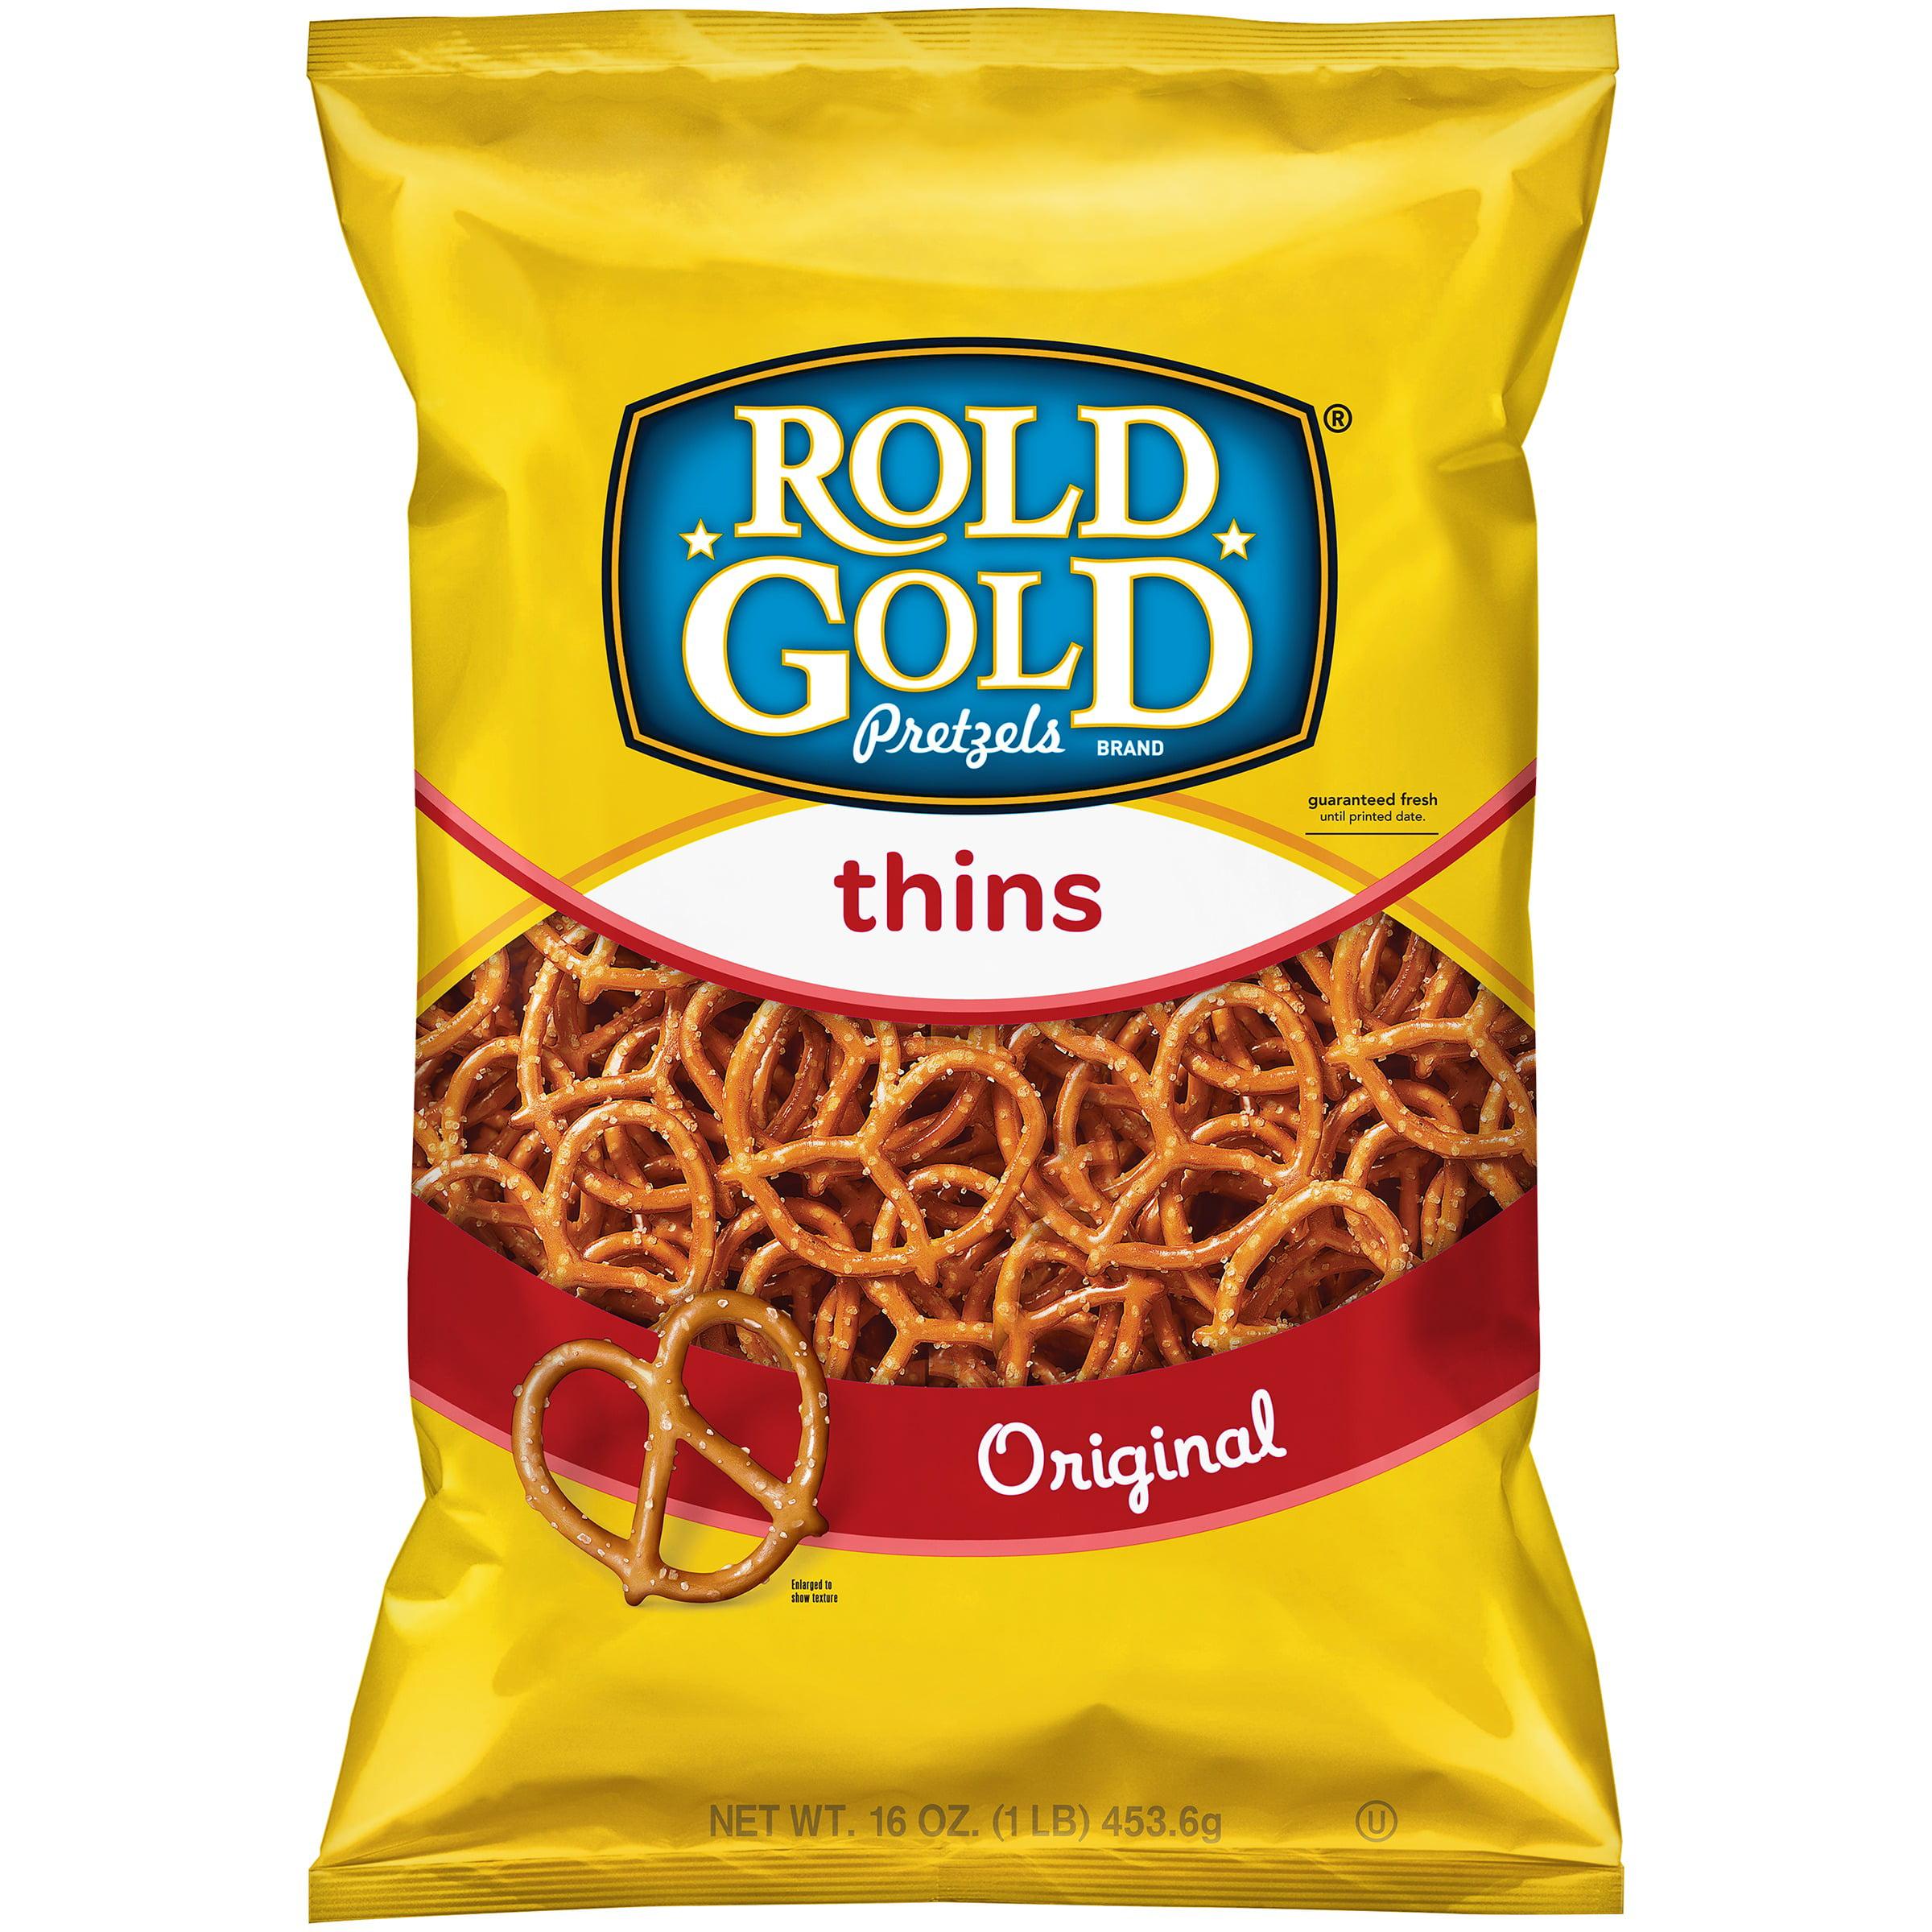 Rold GoldThins Original Pretzels 16 oz. Bag by Frito-Lay, Inc.